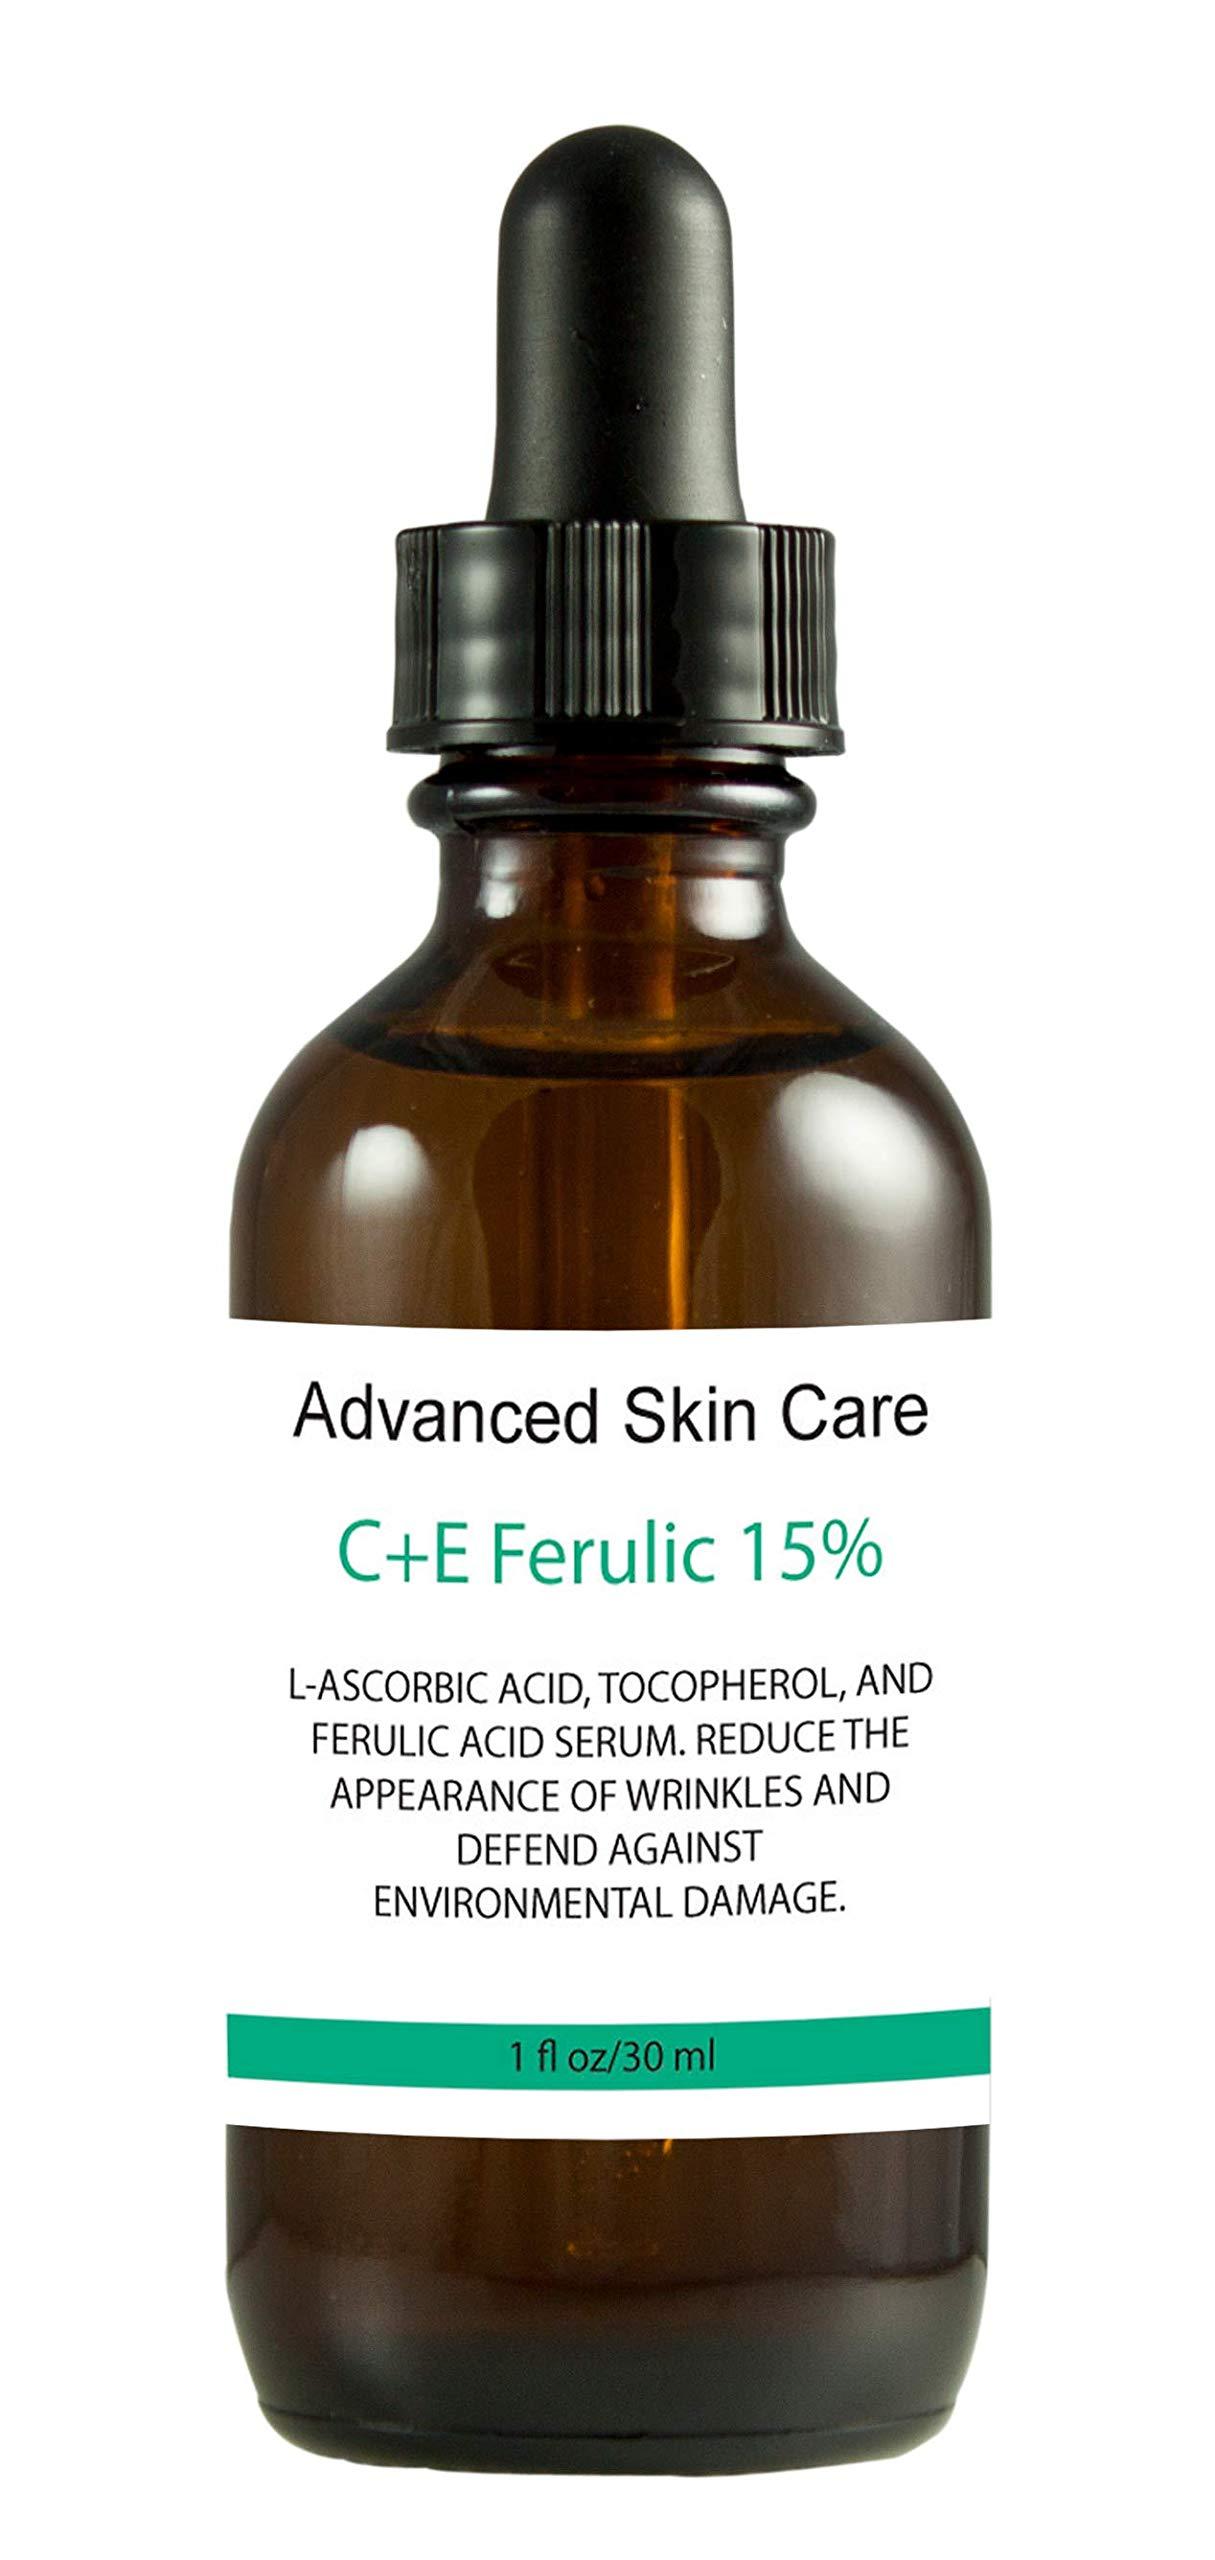 15% Vitamin C and Vitamin E serum with Ferulic Acid, Skin Brightening, Collagen boosting, fights hyperpigmentation, boosts collagen, fades dark spots (2 oz) by Advanced Skin Care